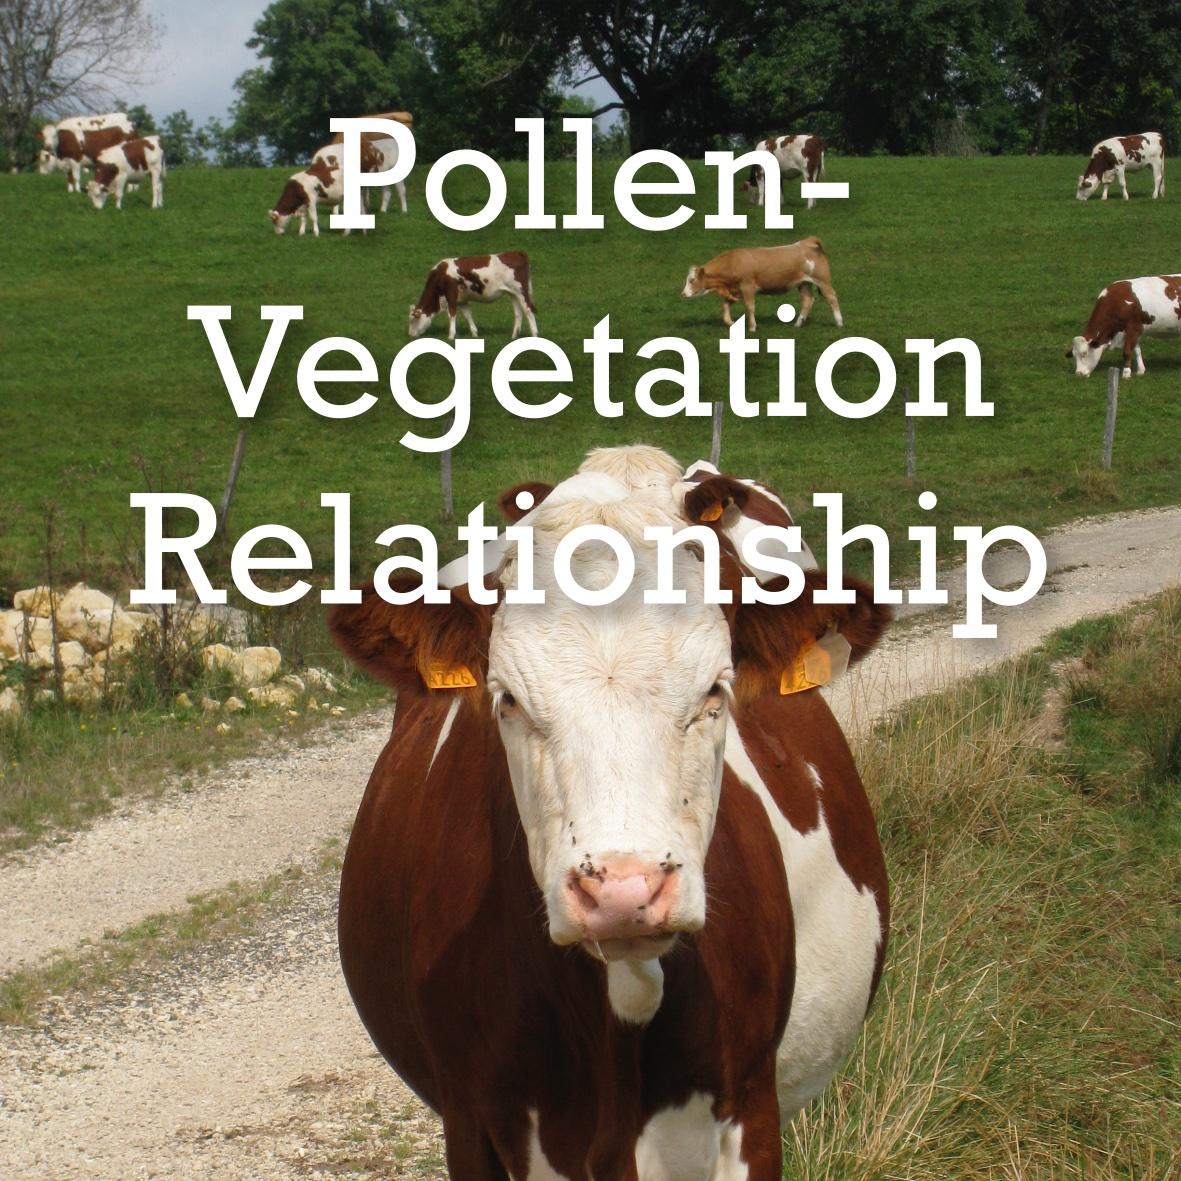 Pollen-Vegetation Relationship